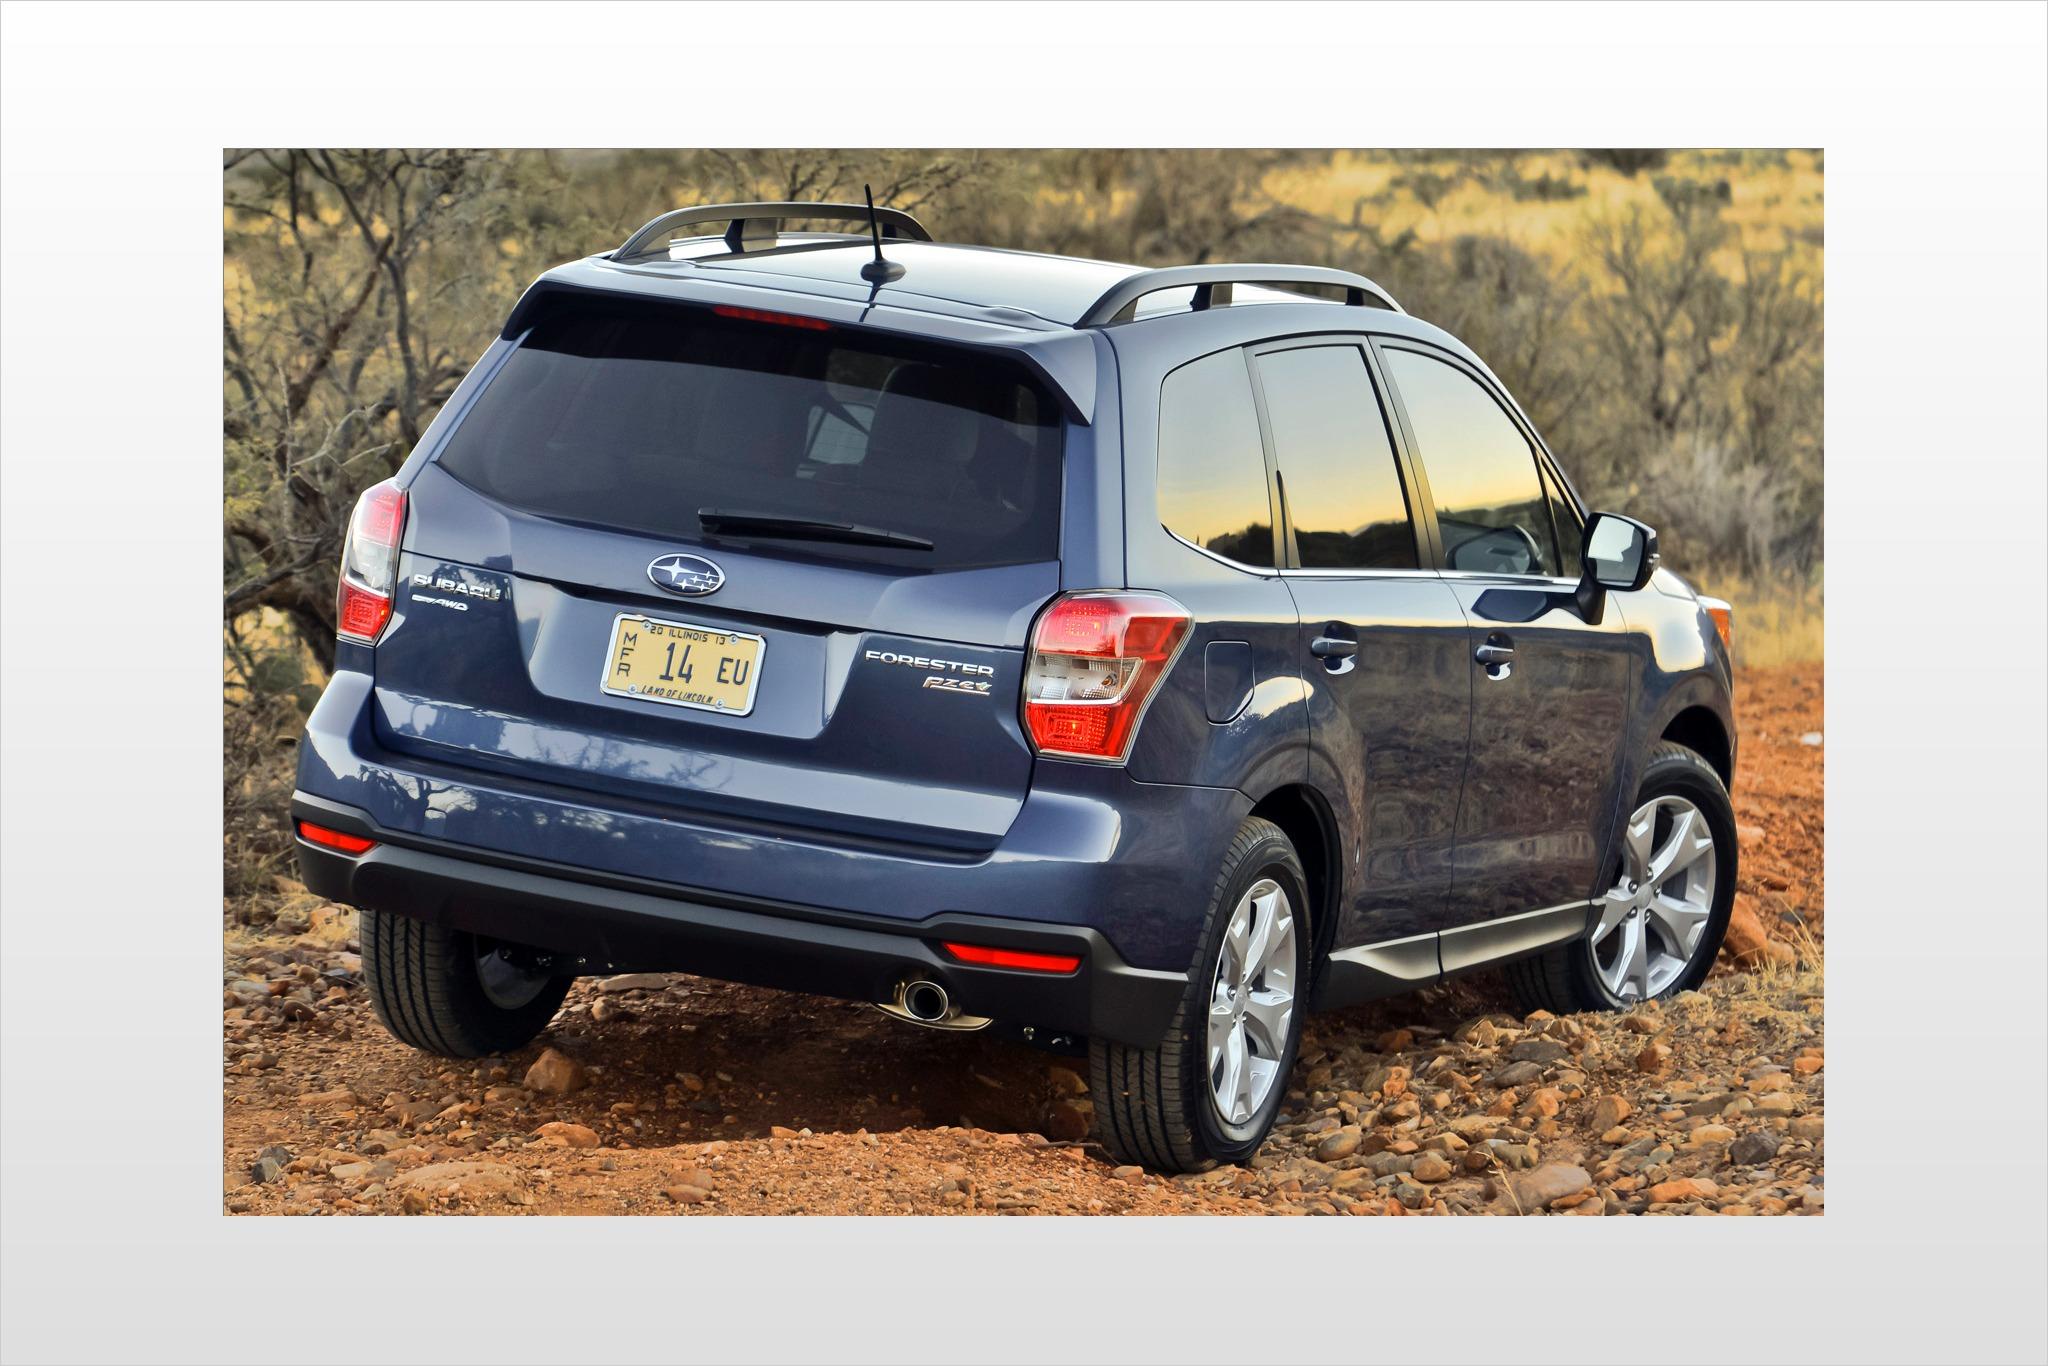 2014 Subaru Forester Vin Check Specs Amp Recalls